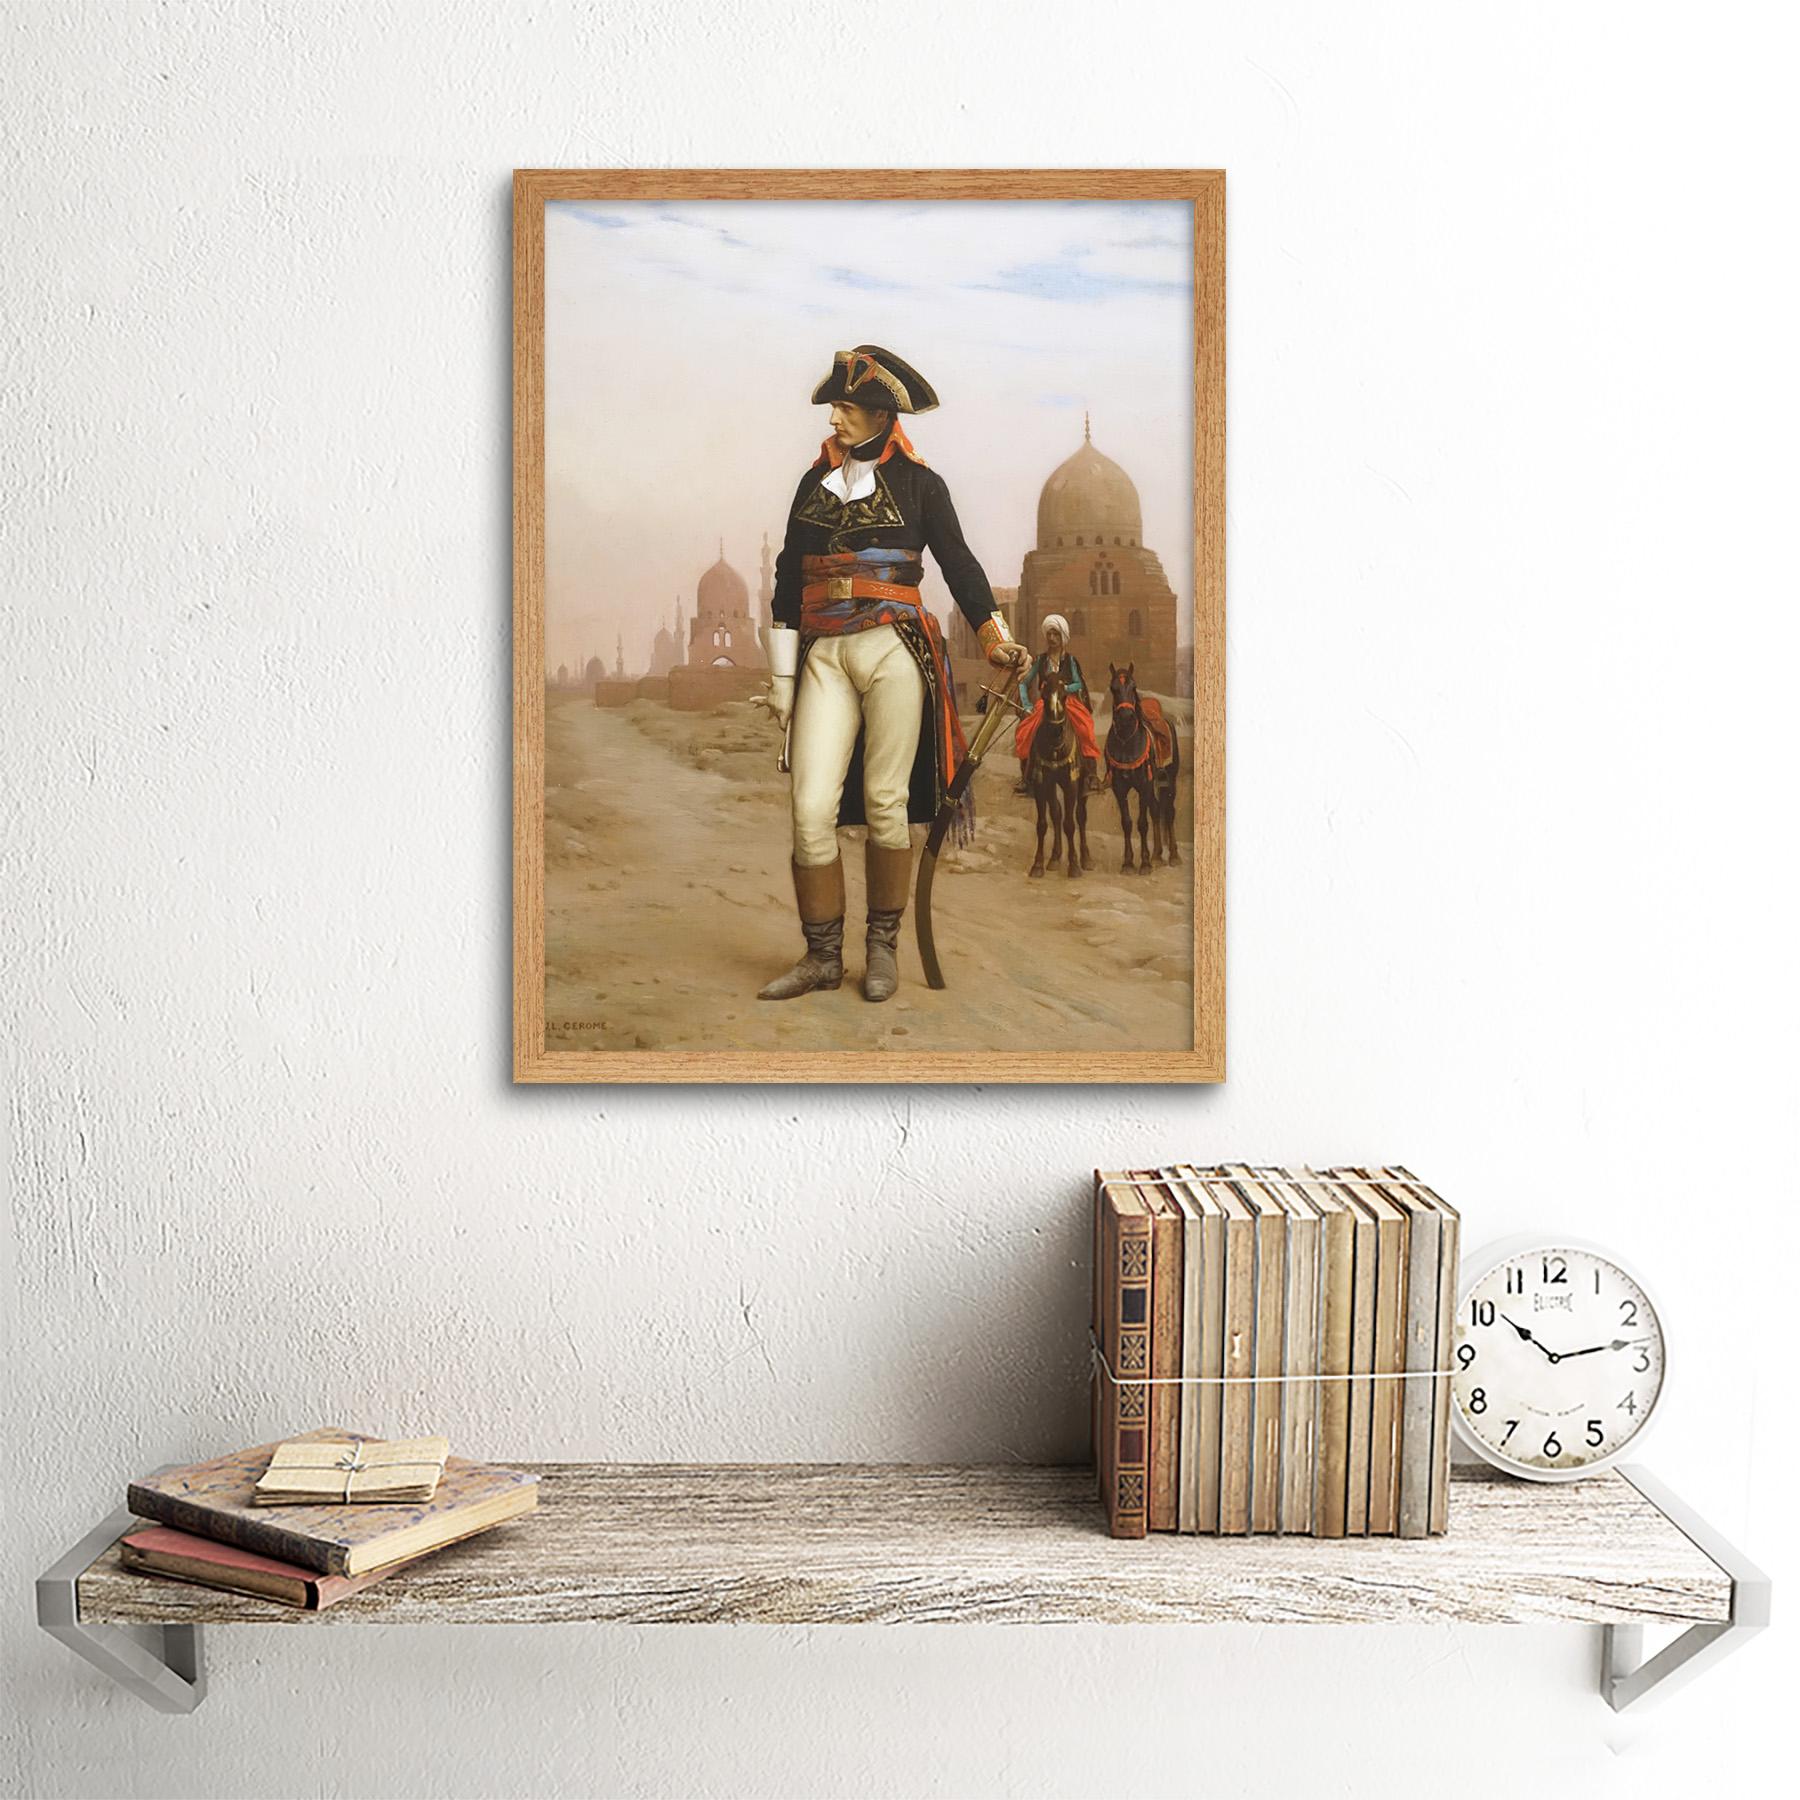 Gerome-Napoleon-Bonaparte-In-Egypt-Painting-Art-Print-Framed-12x16 thumbnail 13